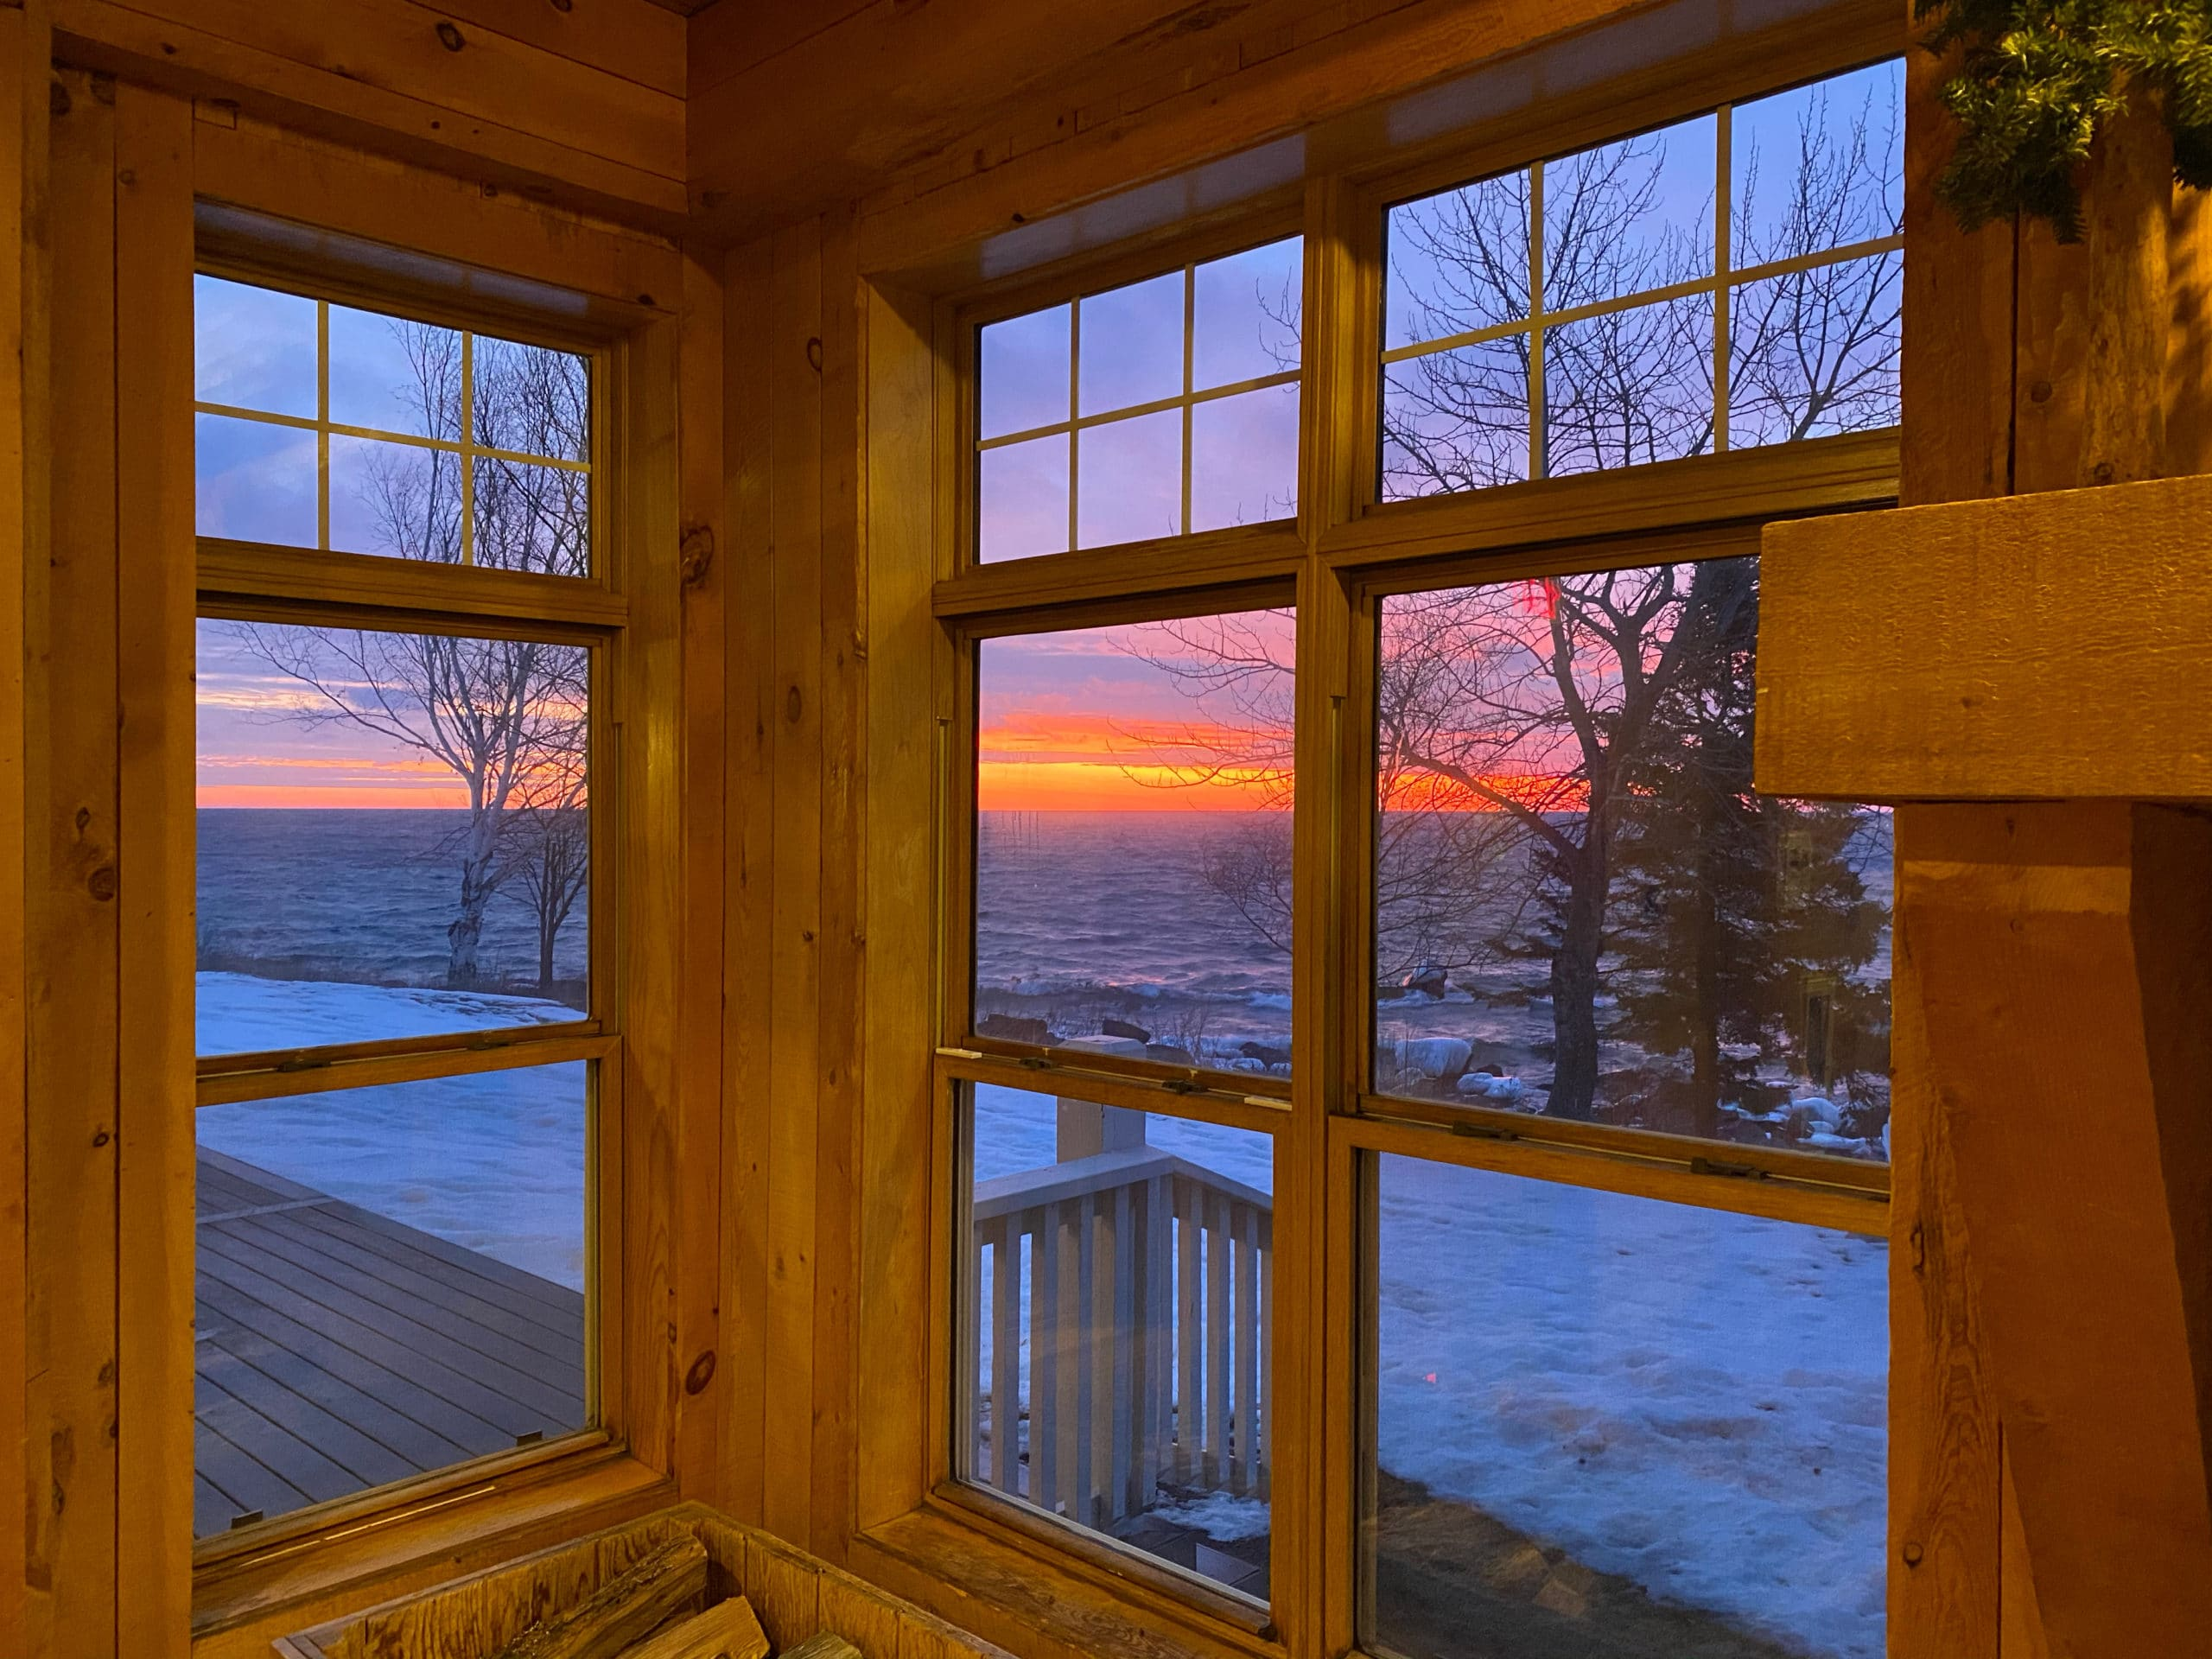 covepointlodge morningsunrise